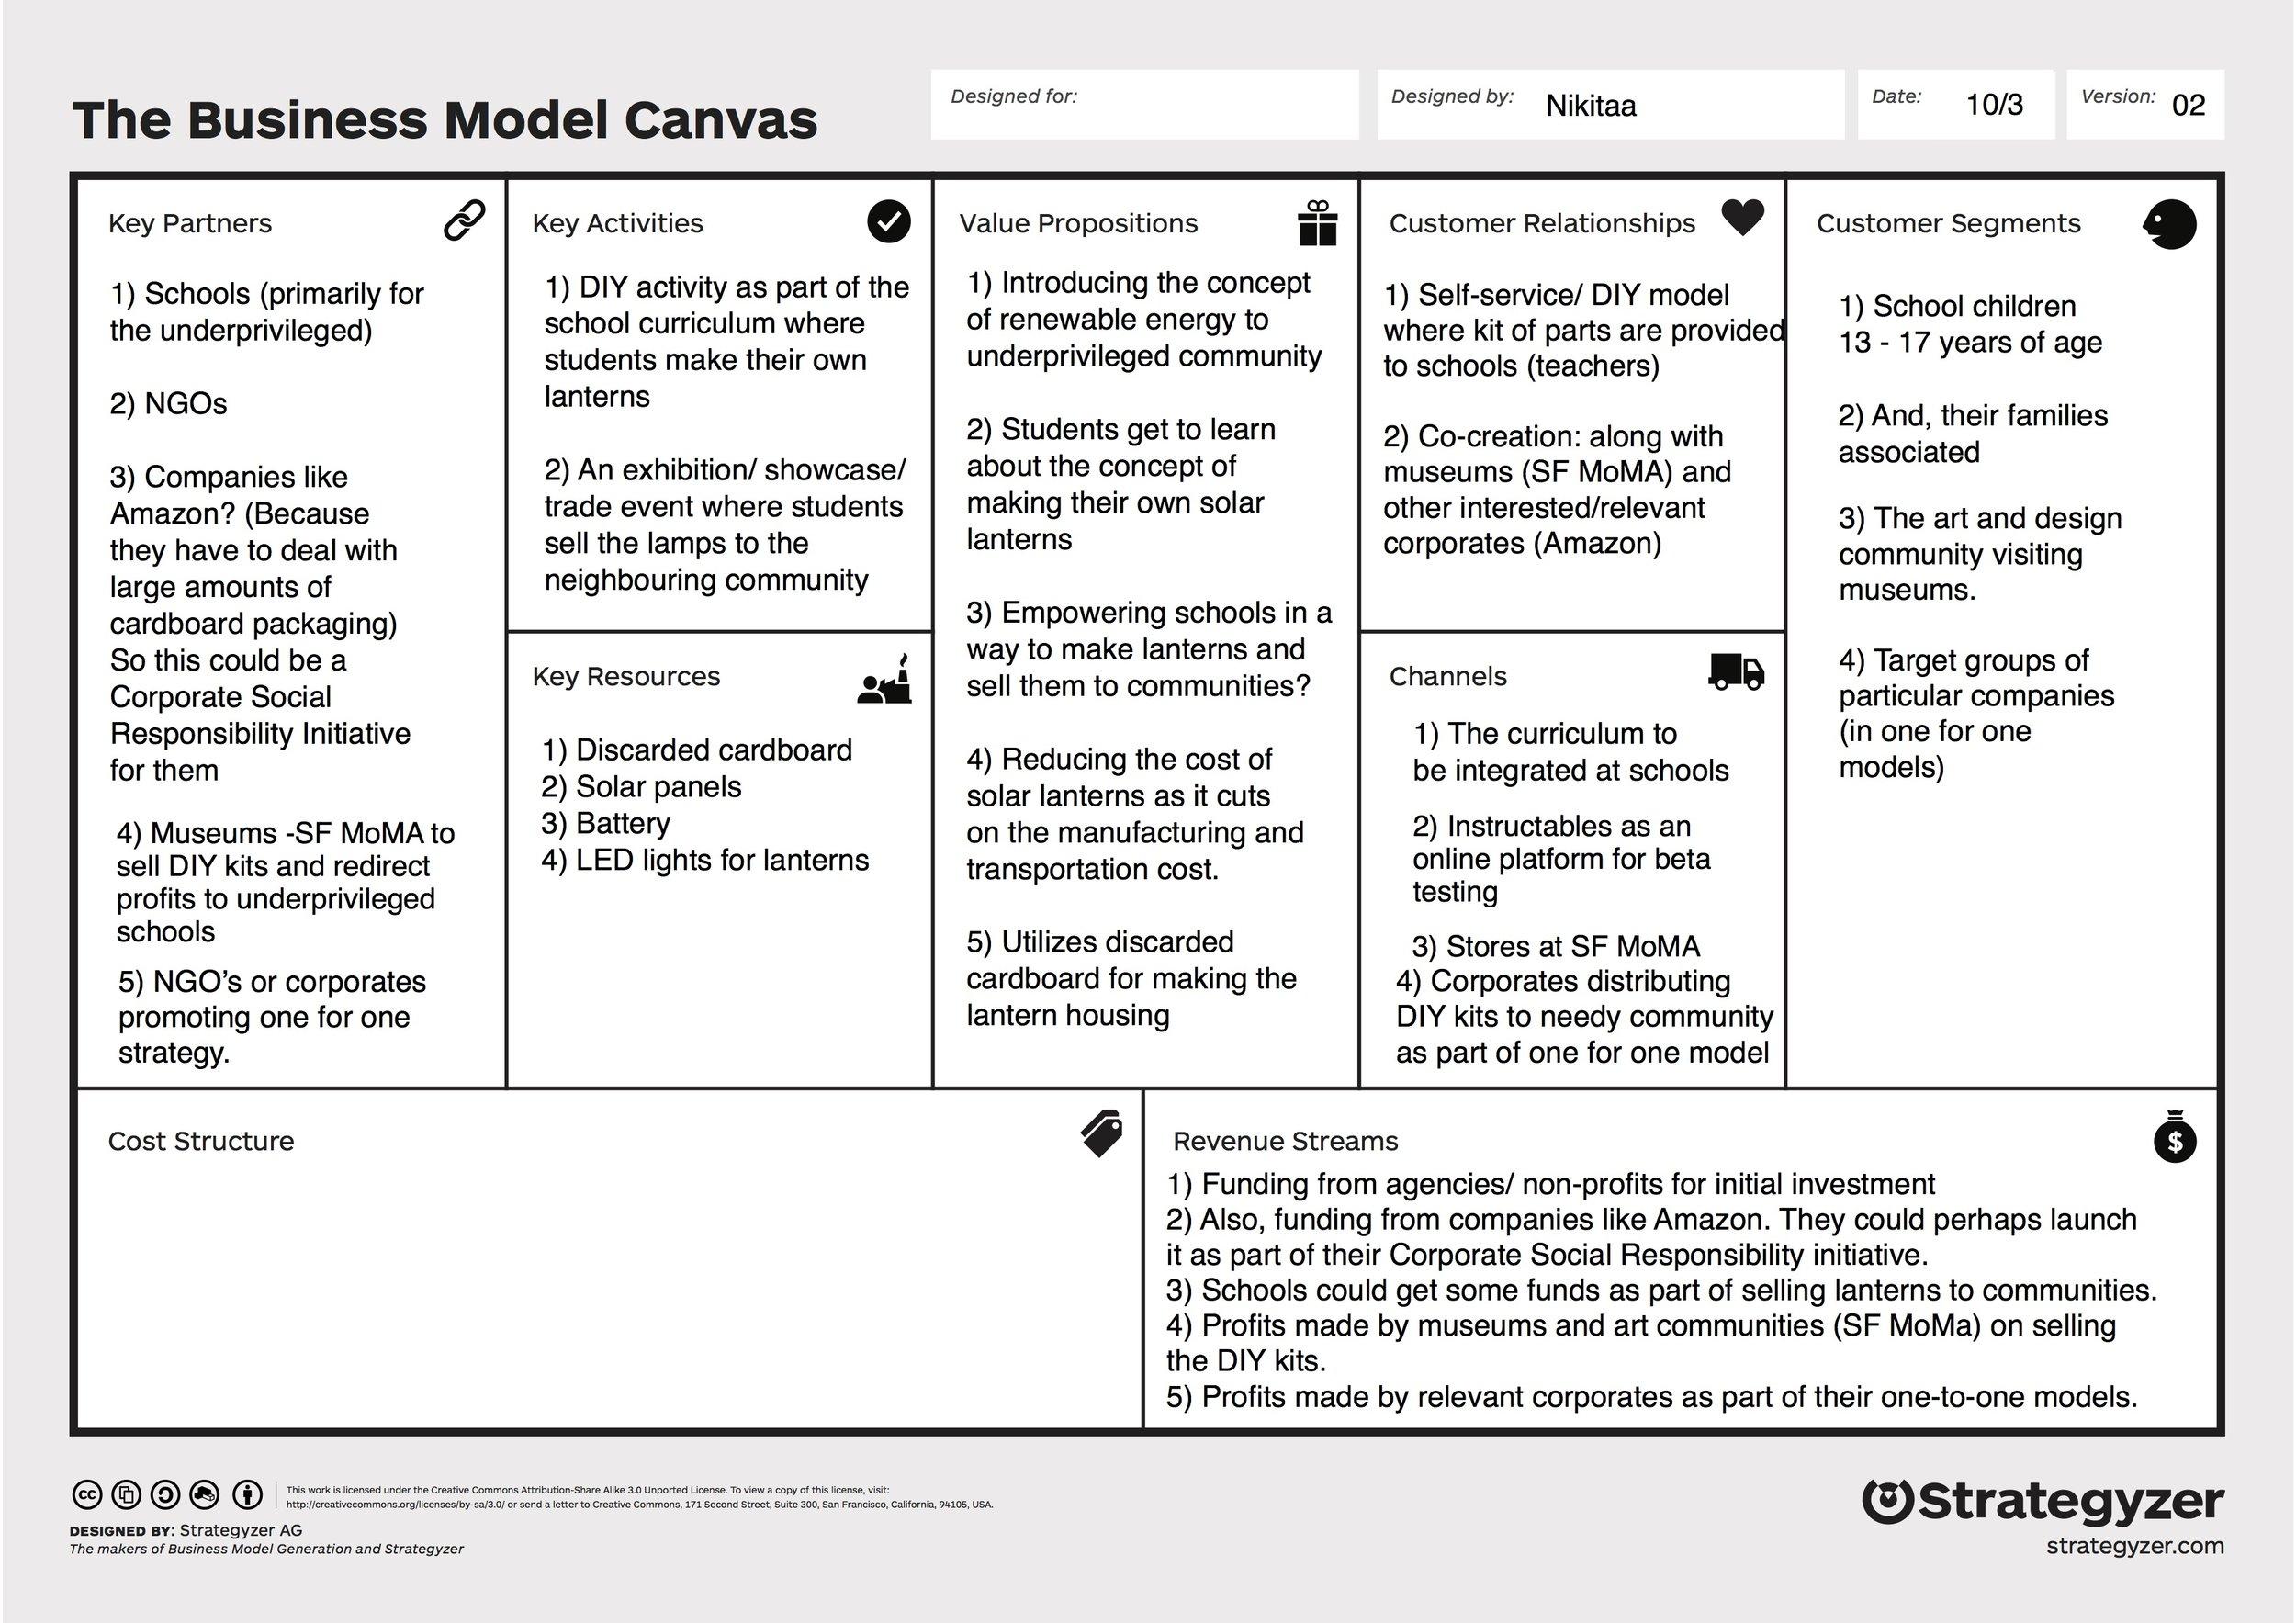 business_model_canvas_poster_ver2.jpg